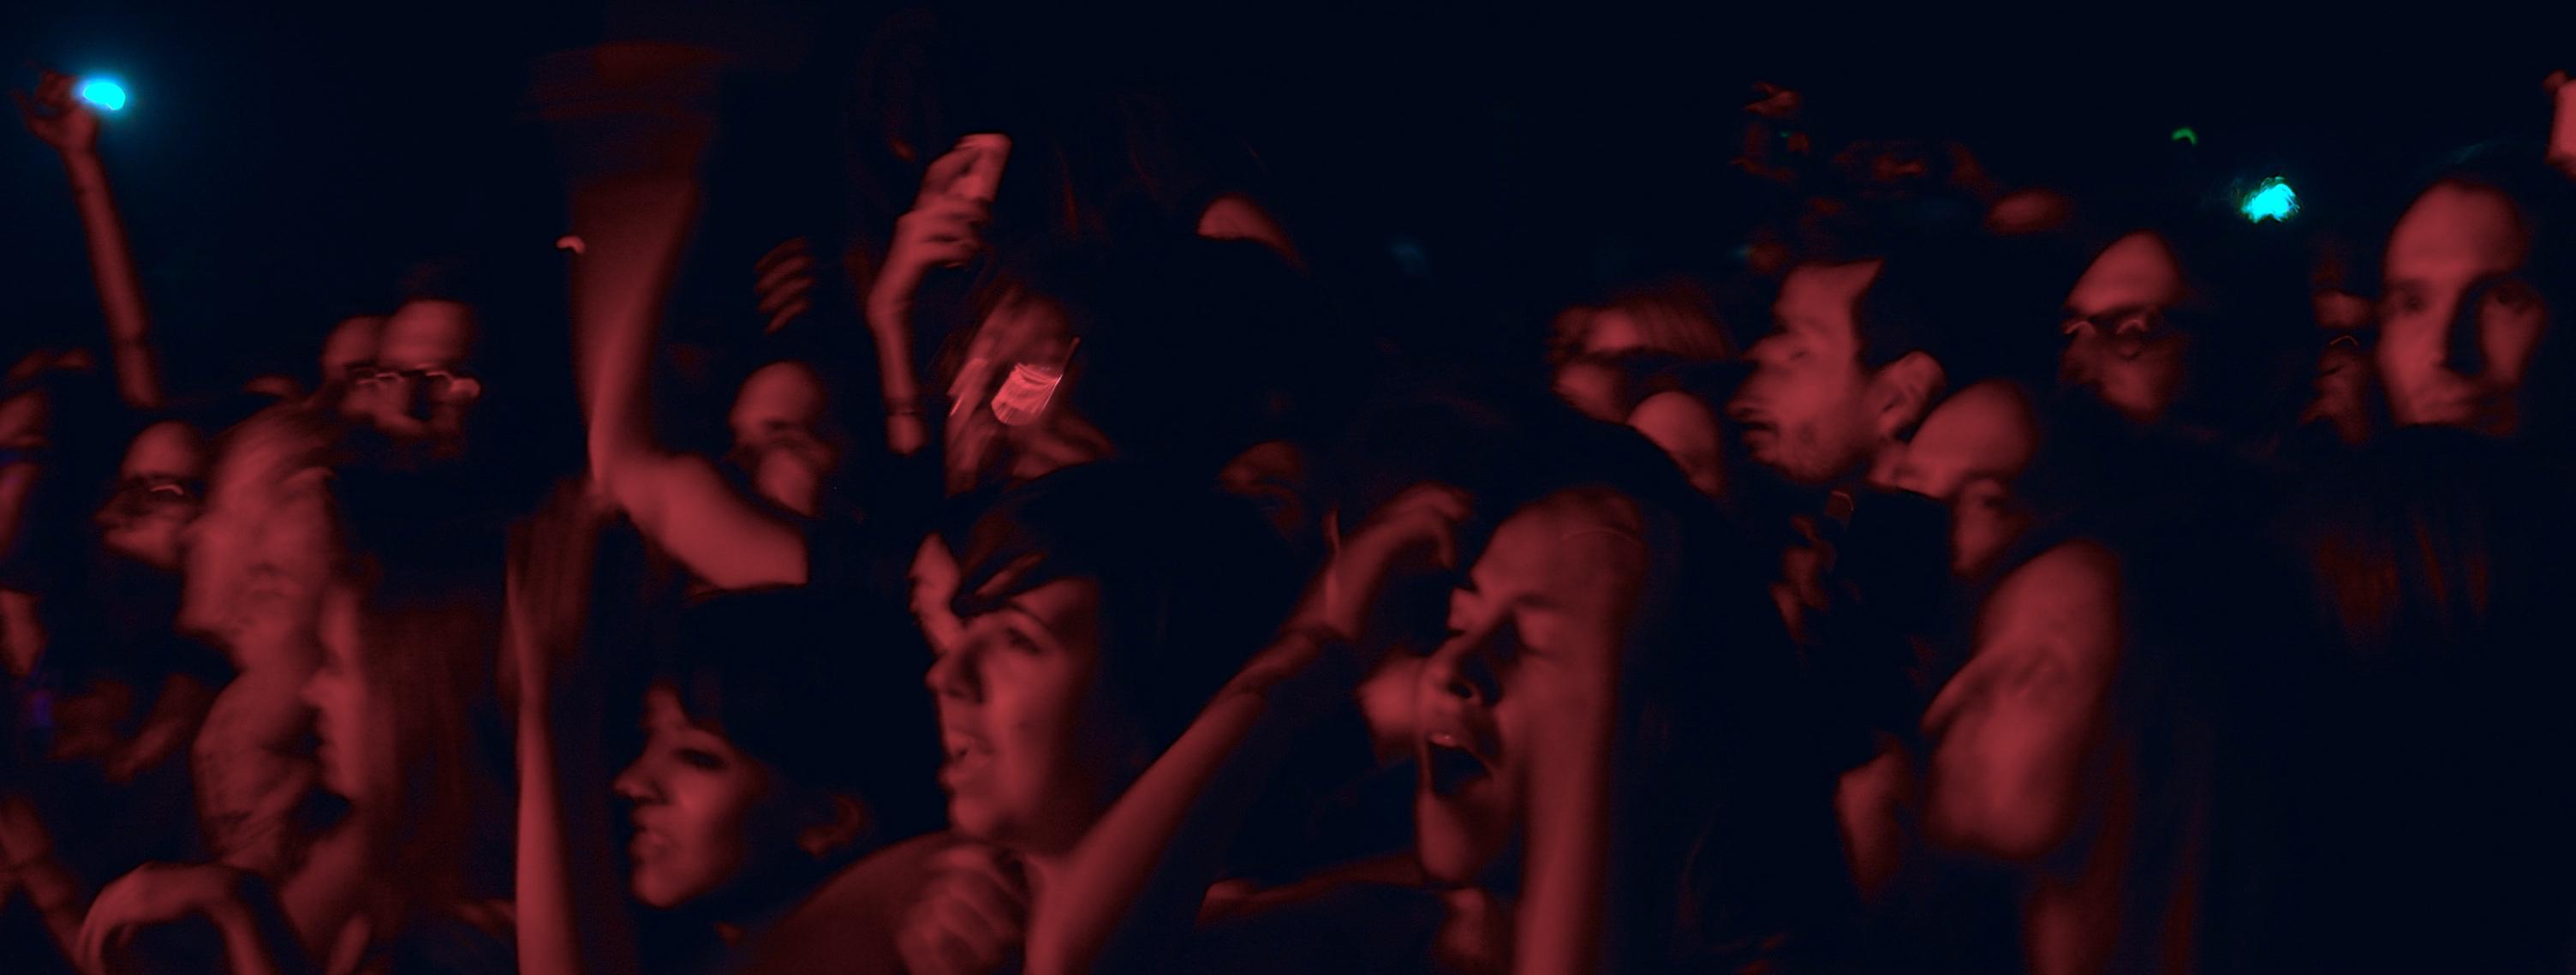 The Strokes Crowd // Photo by Adam Kivel